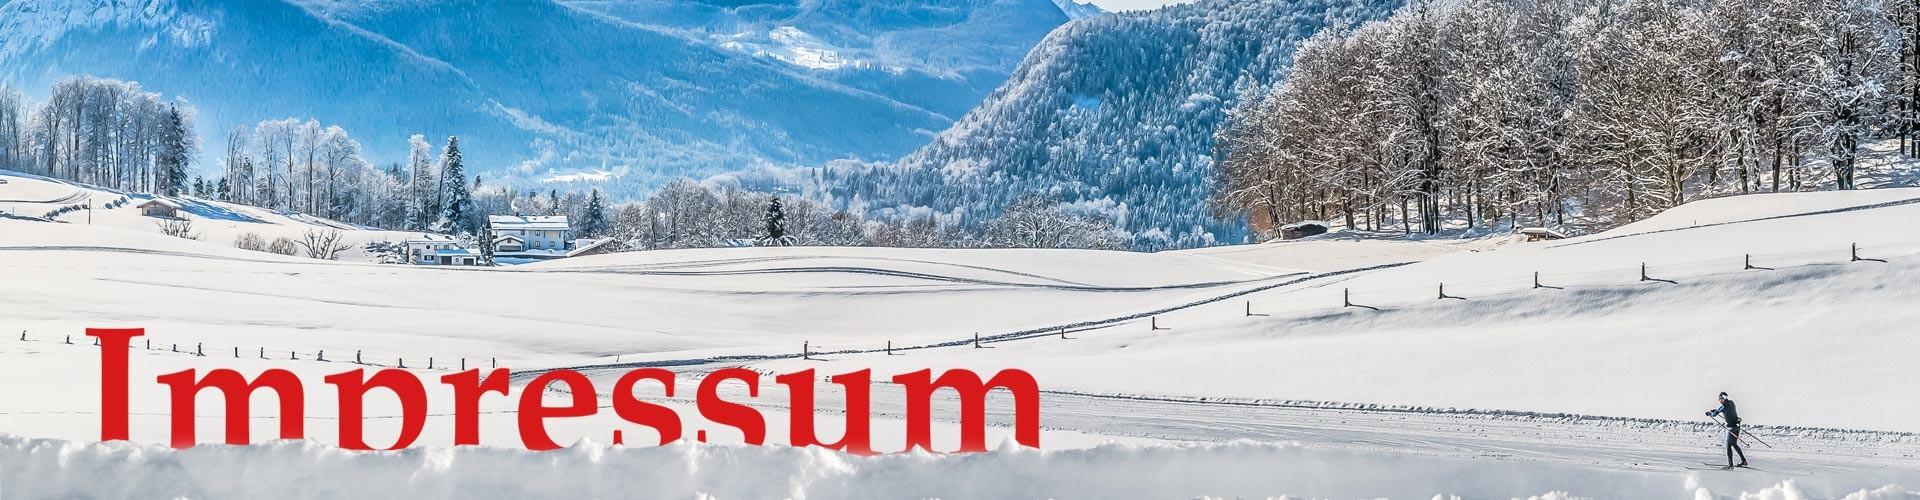 Impressum berchtesgaden-online